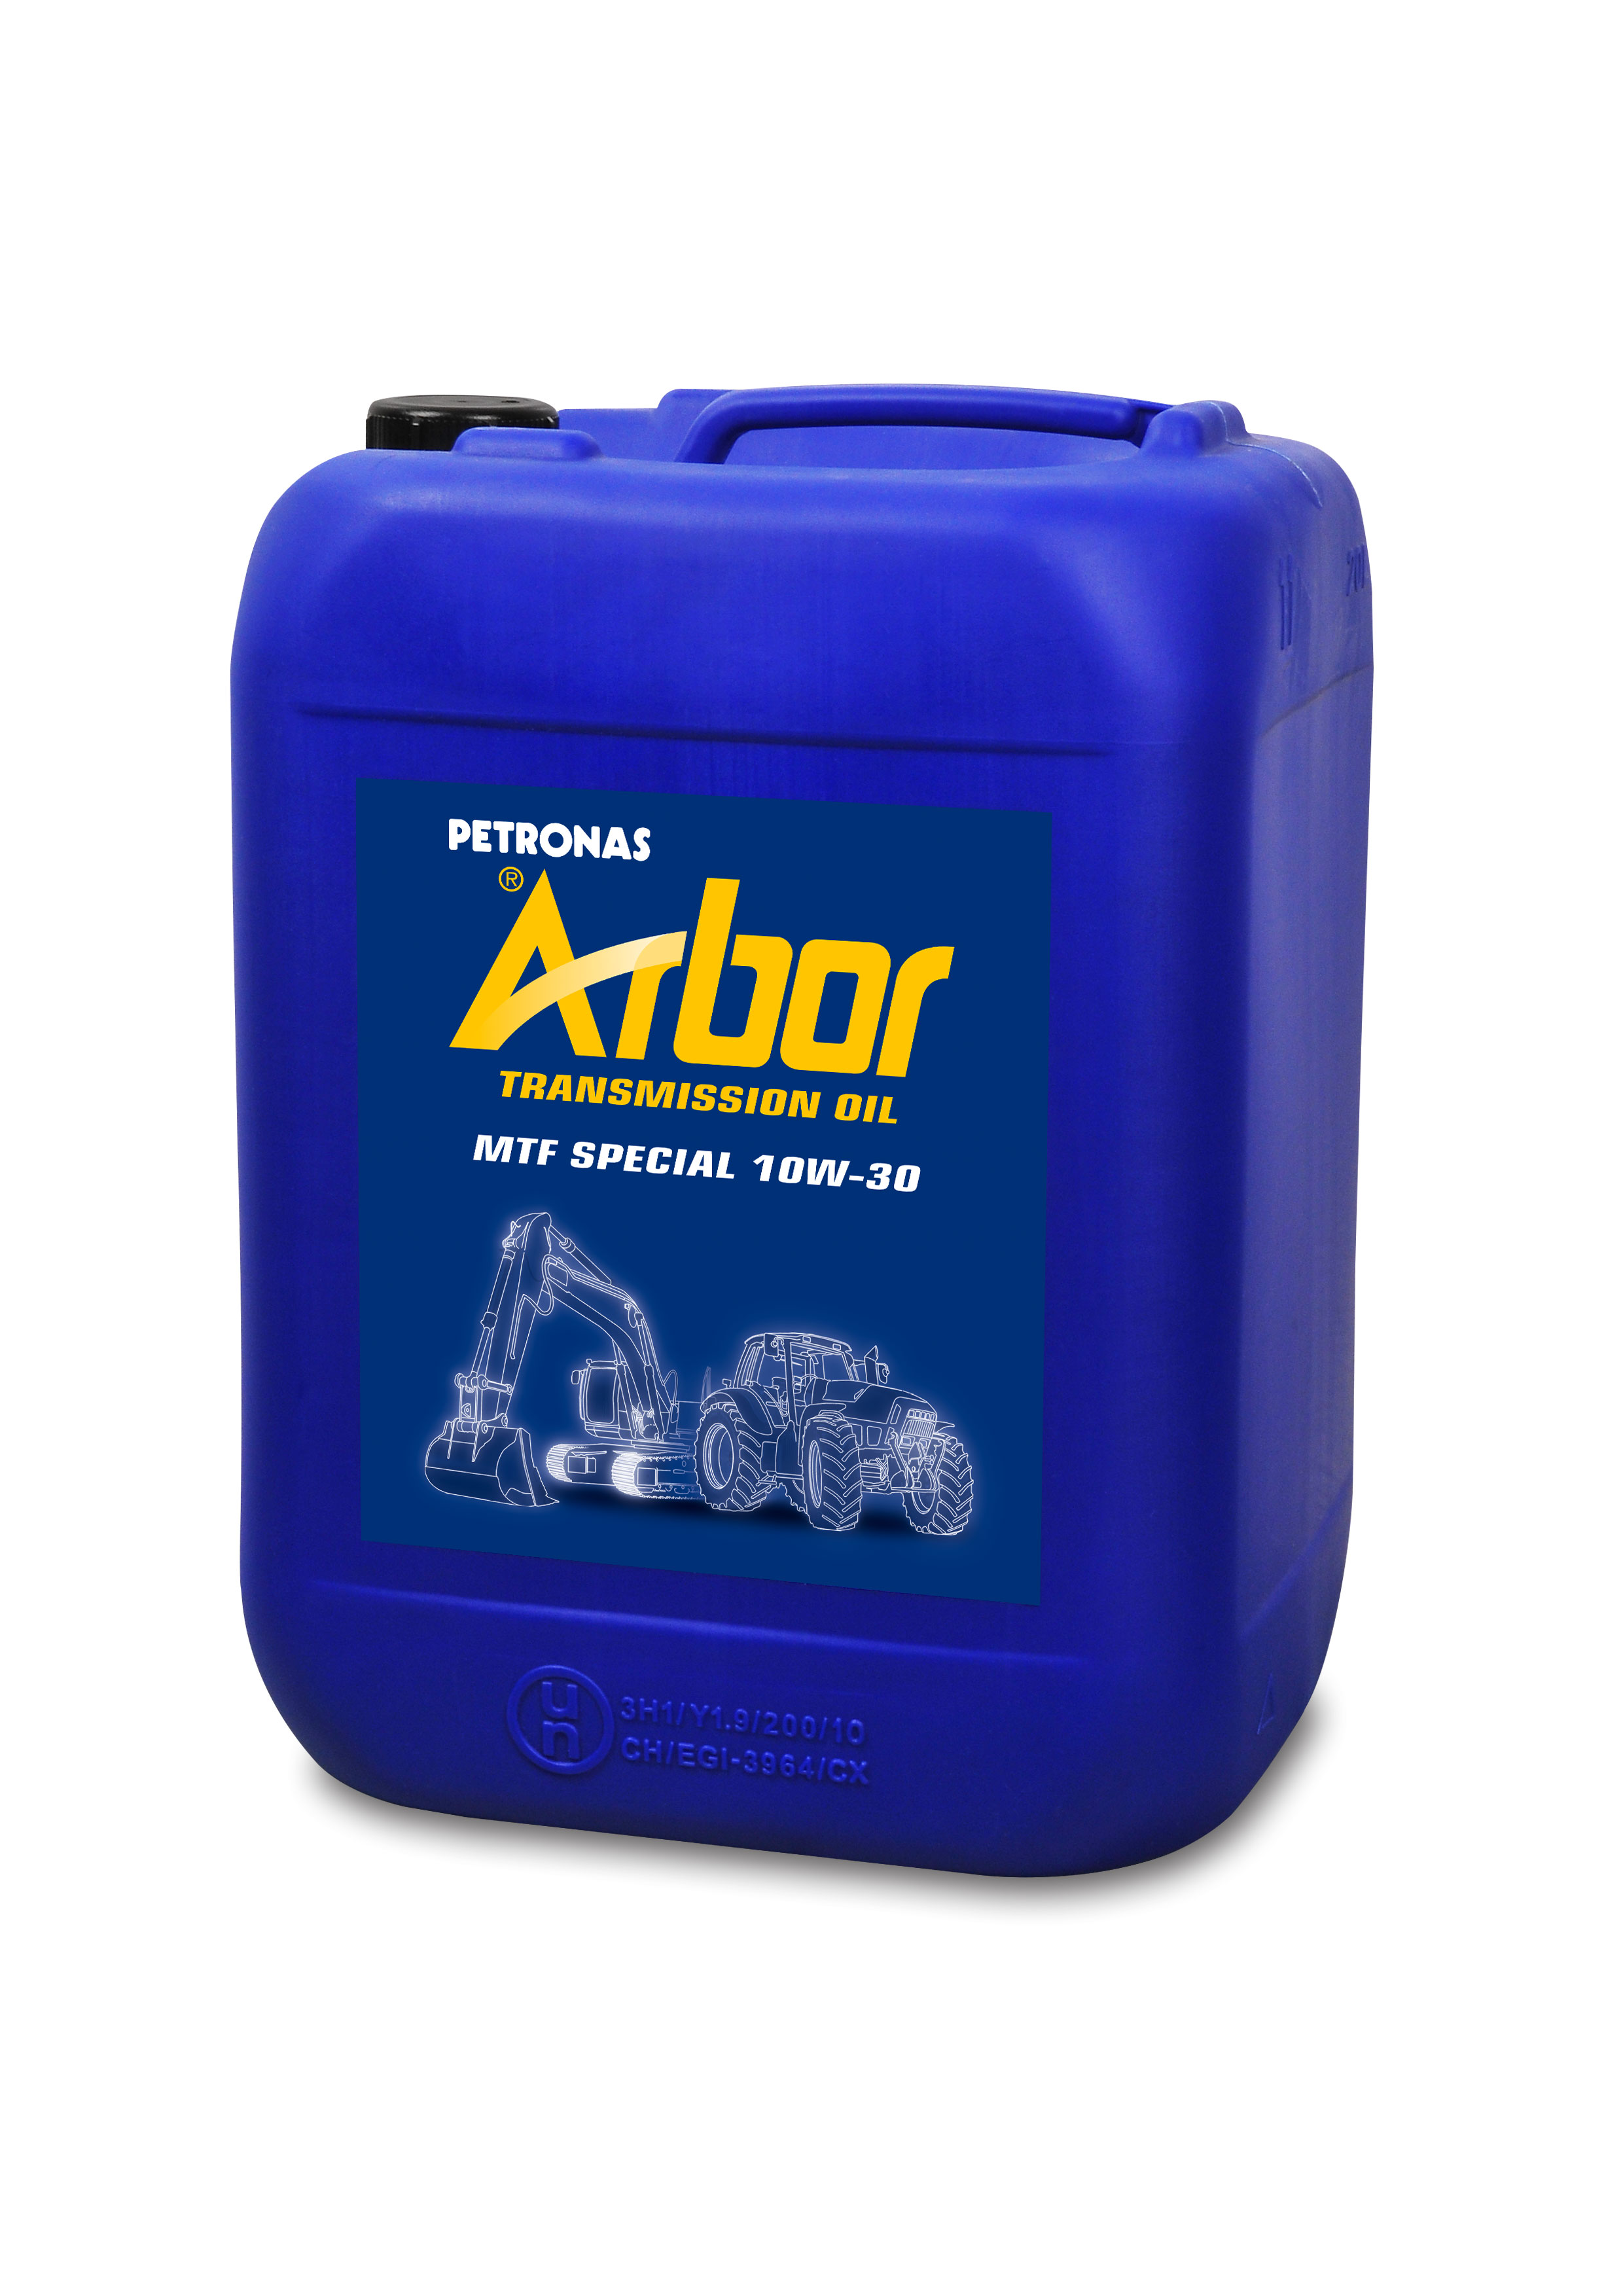 ARBOR MTF SPECIAL 10W30